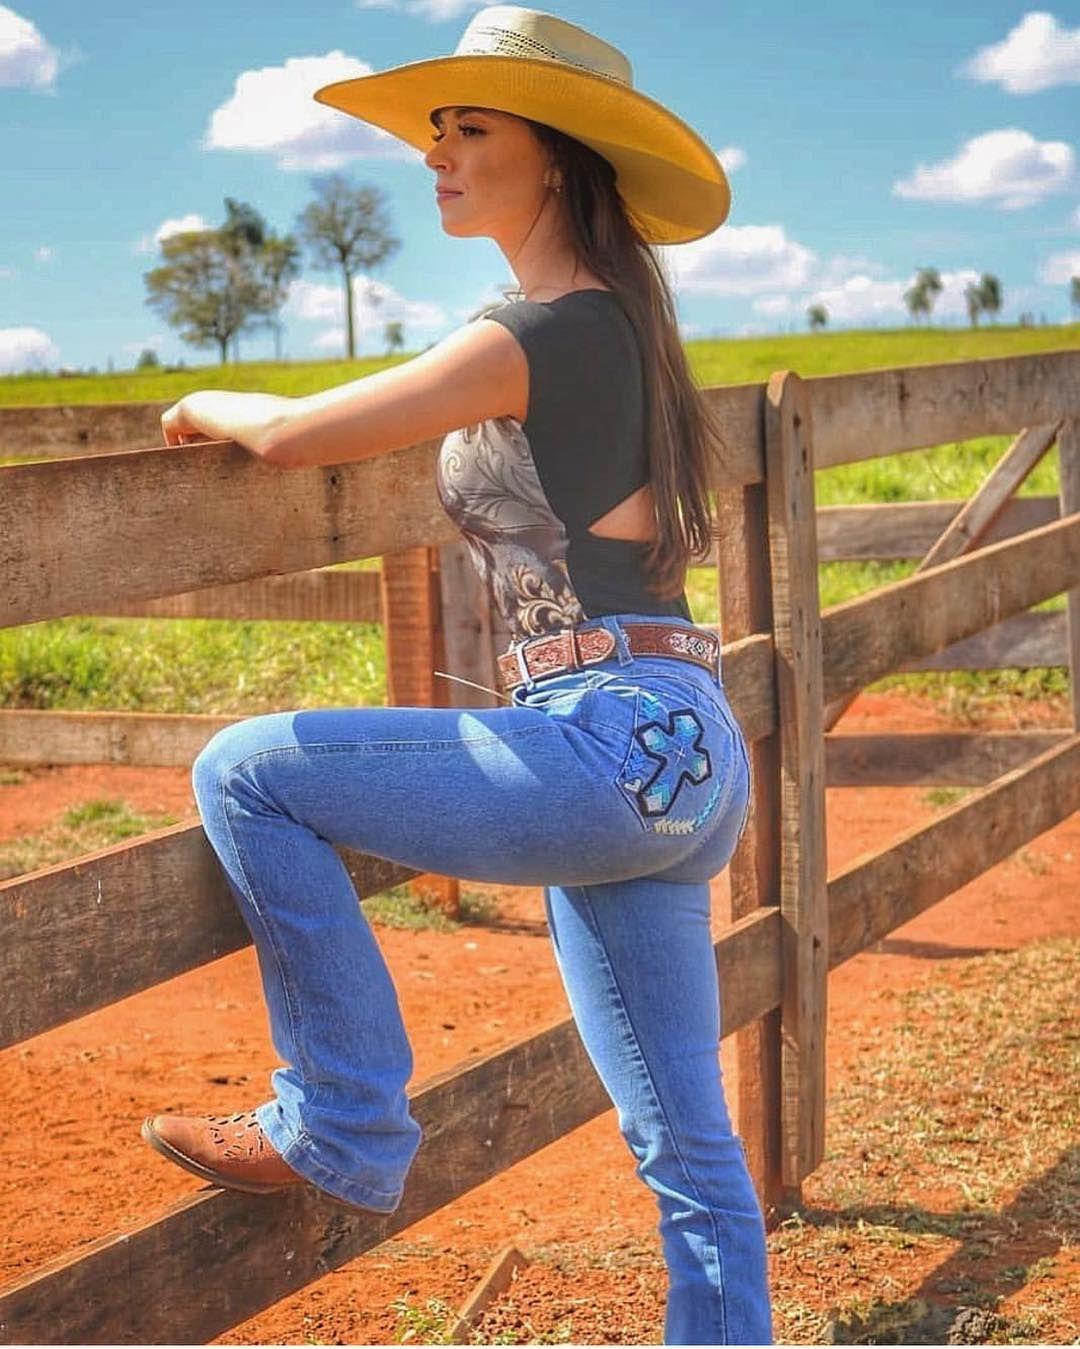 00598b1071f34 Foto da  gabriellaarantes97 com seu chapéu!  MulherDeChapeu  Chapeu   Cowgirl  Botina  Mulher  Rodeio  FestaDoPeao  Mato  VidaNoCampo  Simples   Campo ...